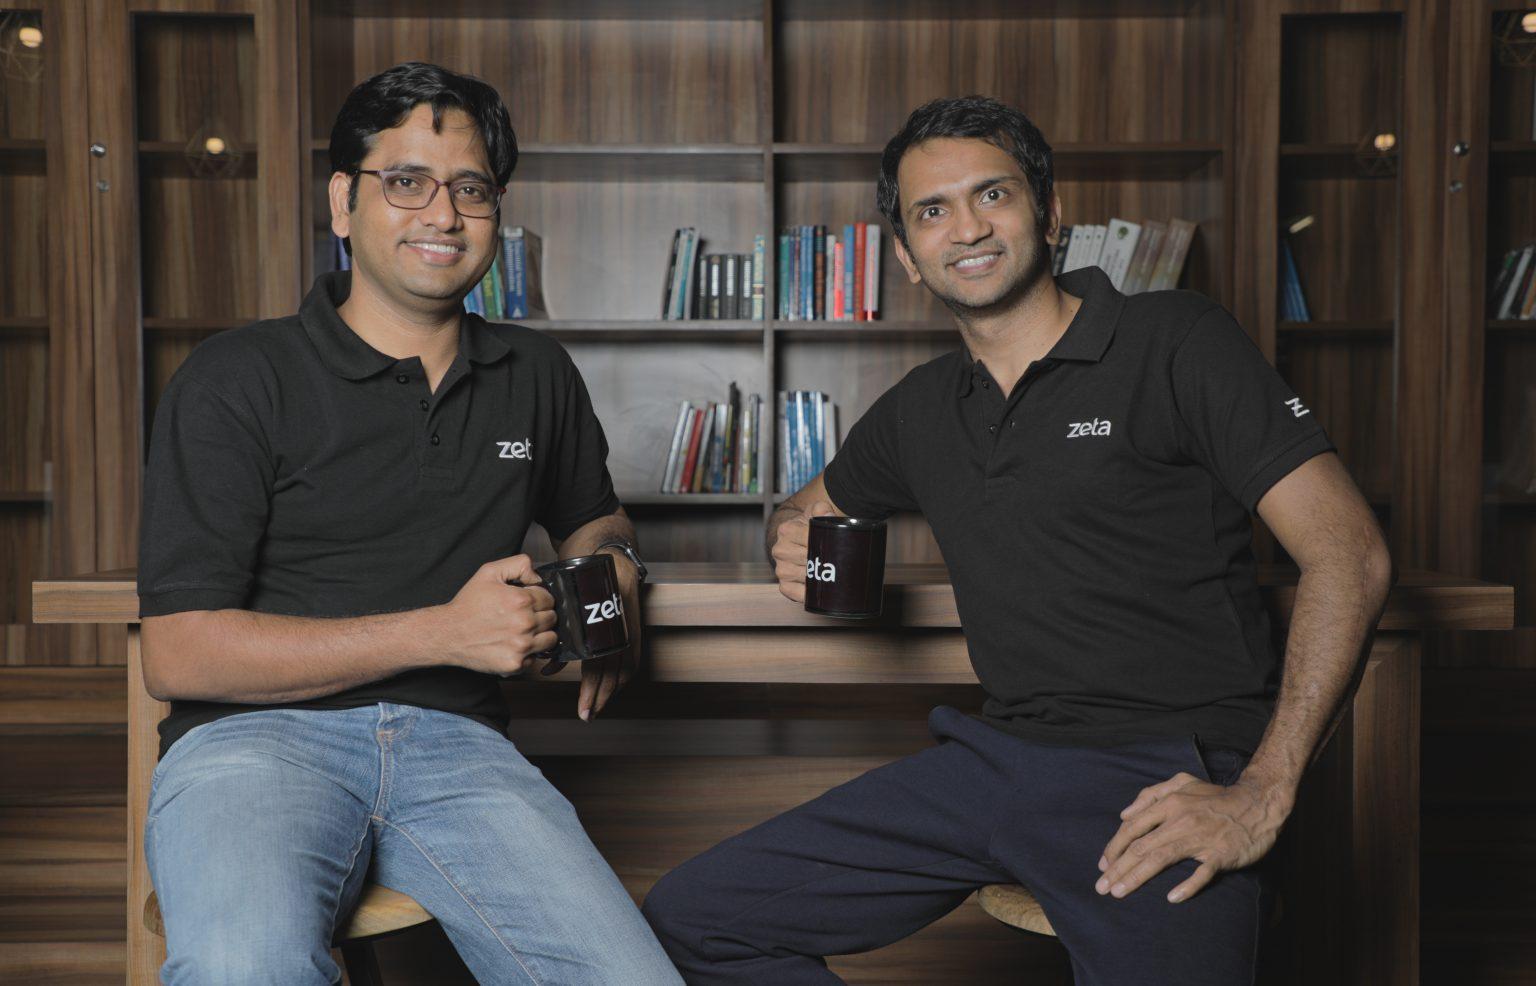 Zeta becomes 14th Indian unicorn this year after SoftBank funding | সফটব্যাঙ্ক ফান্ডিং এর পর 14 তম ভারতীয় ইউনিকর্ন হয়েছে জেটা_40.1